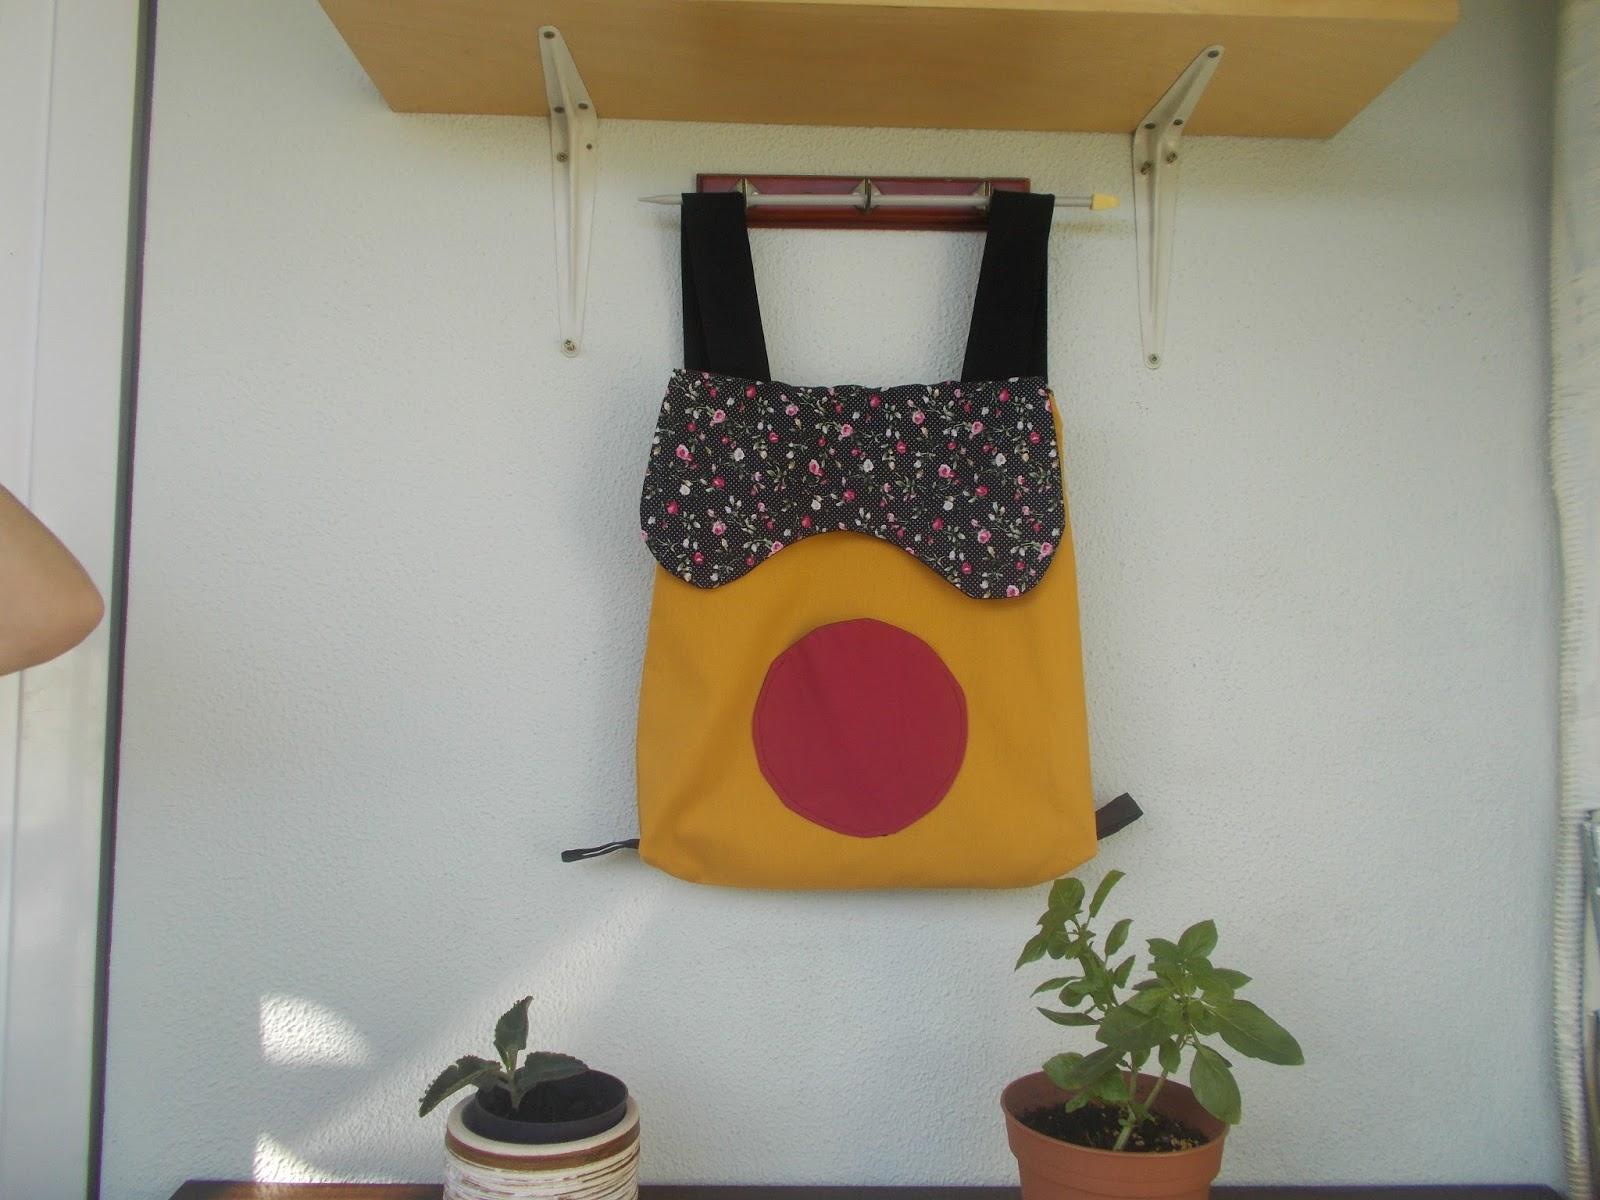 933420783e 5. καλοκαιρινή τσάντα πλάτης υφασμάτινη με εξωτερική τσέπη διαστάσεις  40χ40